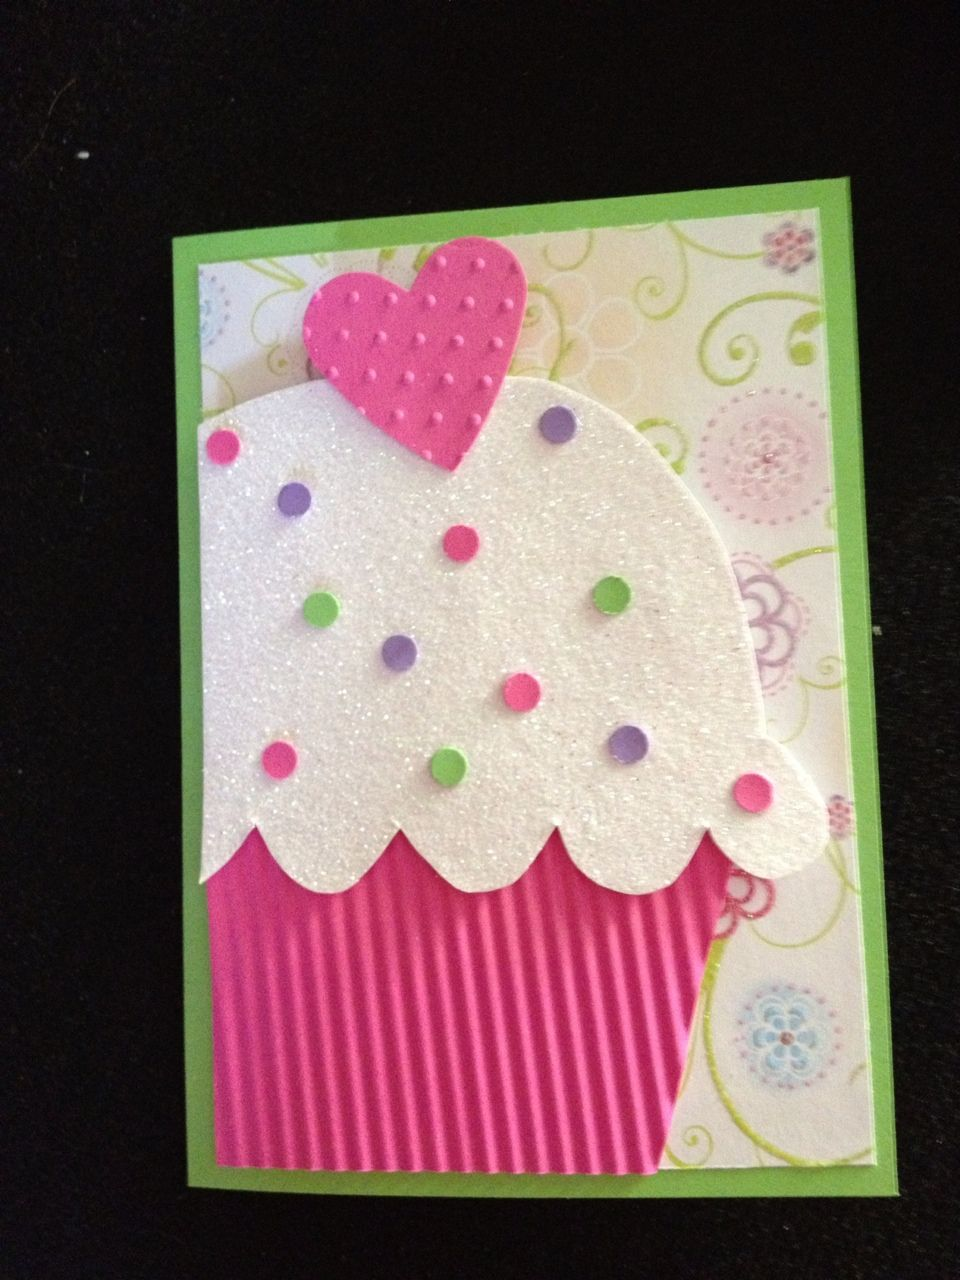 Easy birthday card crafts pinterest birthdays easy and cards easy birthday card kristyandbryce Gallery